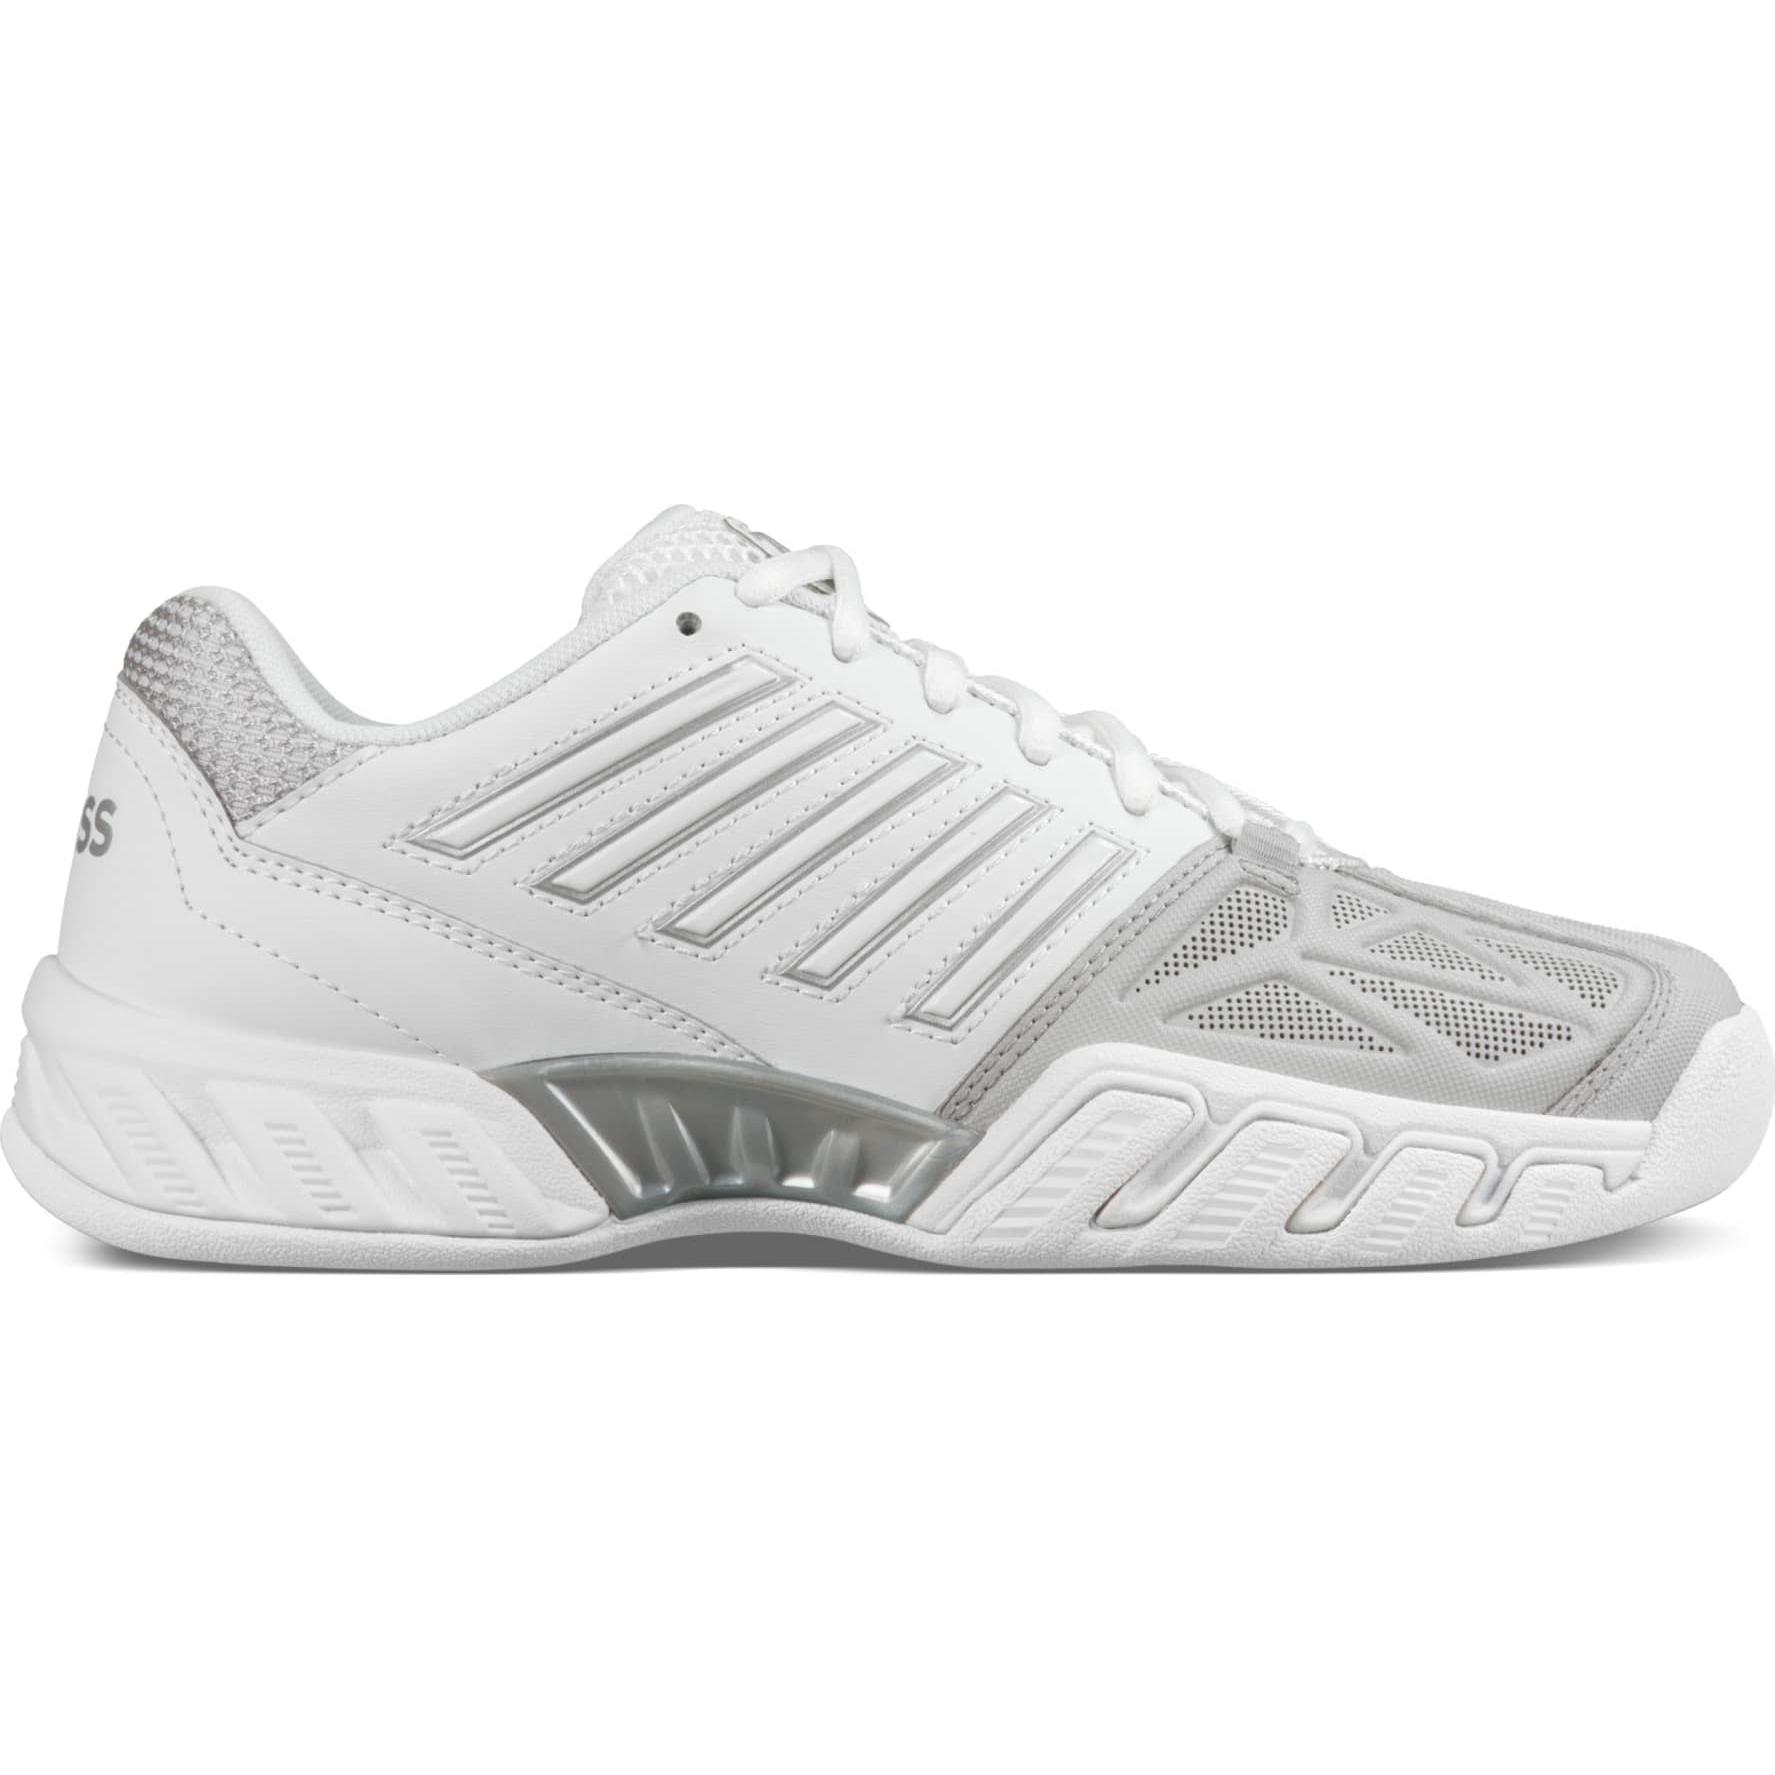 b346b60a8b3 K-Swiss Womens BigShot Light 3 Carpet Tennis Shoes - White/Silver